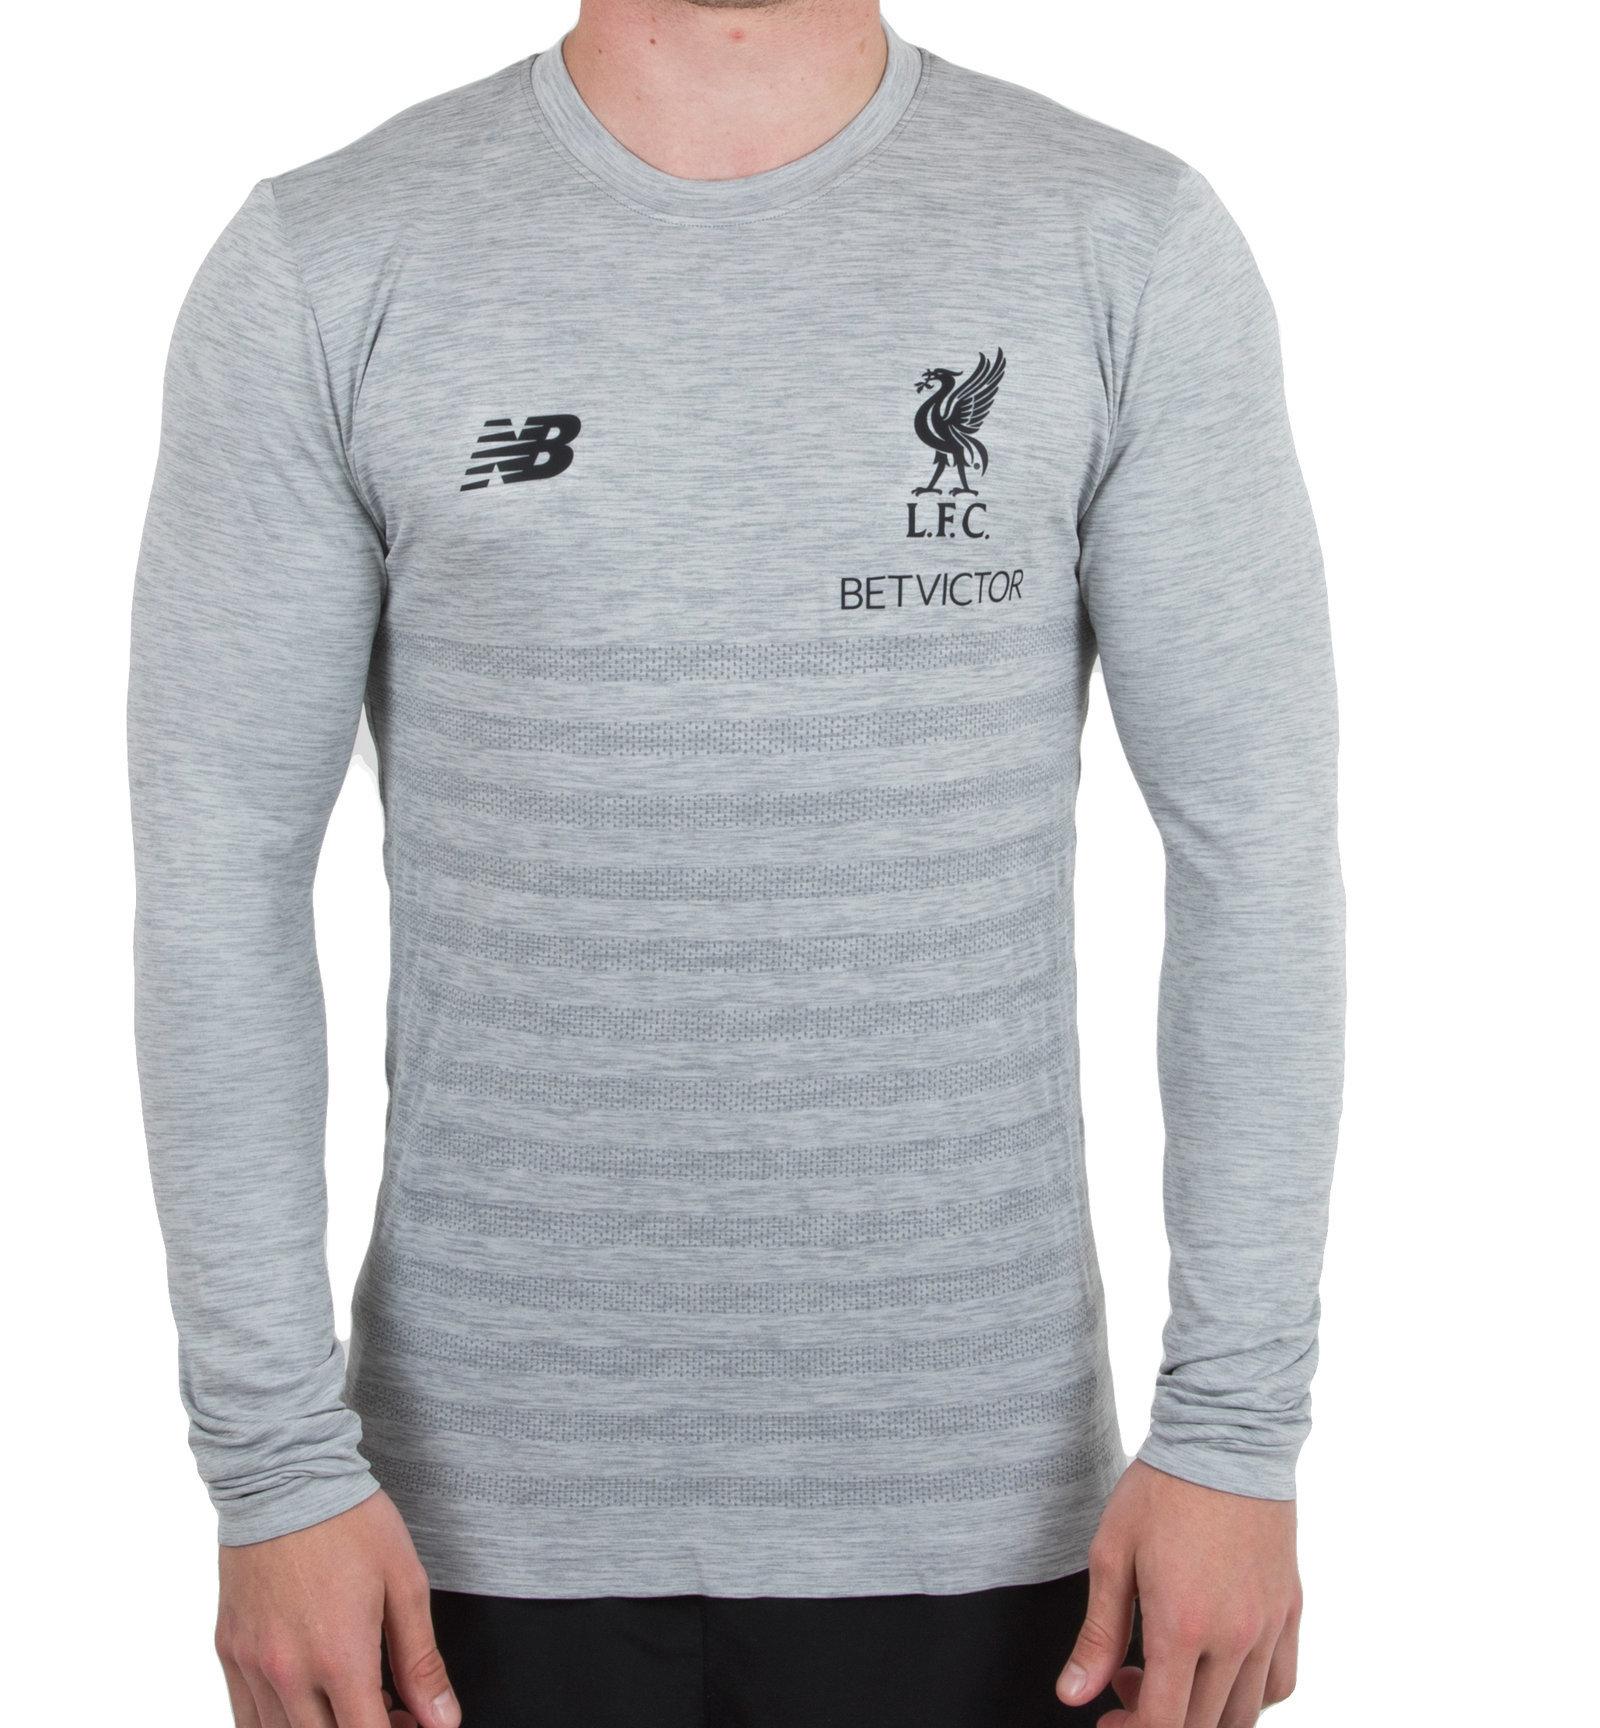 550a0430b New Balance Mens Liverpool FC 18/19 Elite Long Sleeve Seamless Training  Shirt